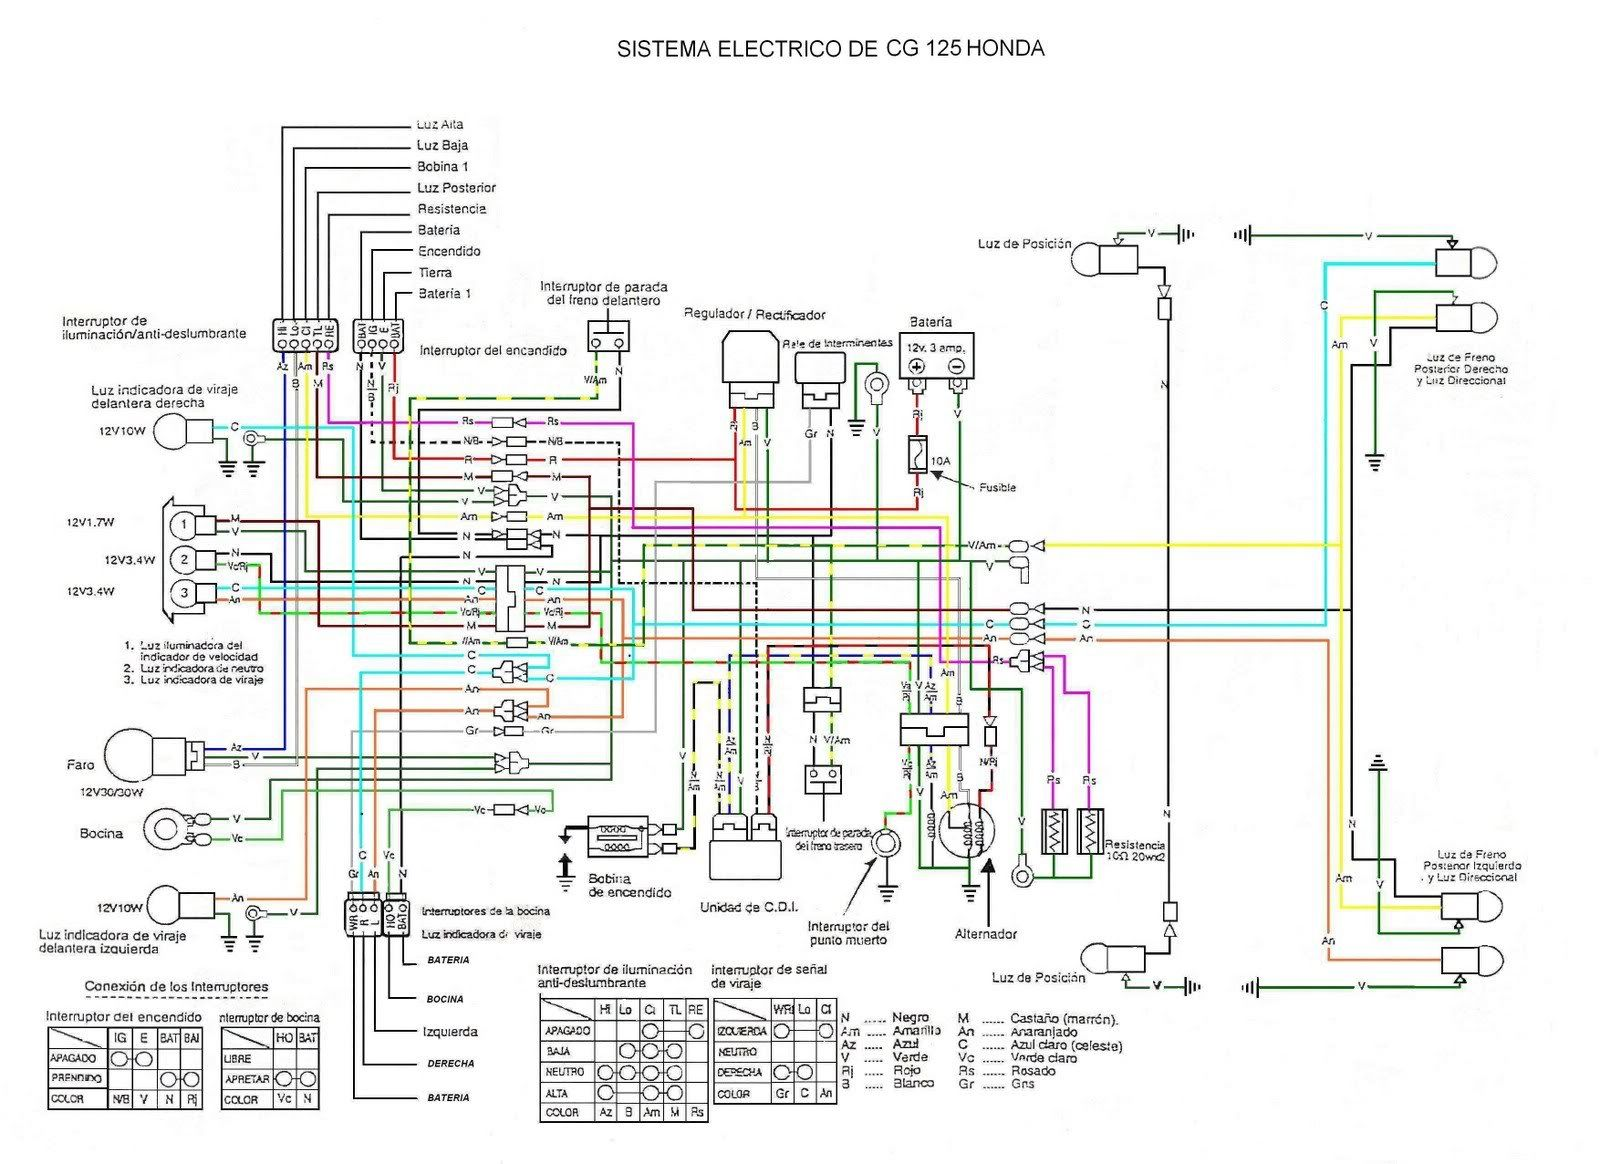 Diagrama o sistema eléctrico de motos chinas | wason  | Sistema electrico, Mecanica de